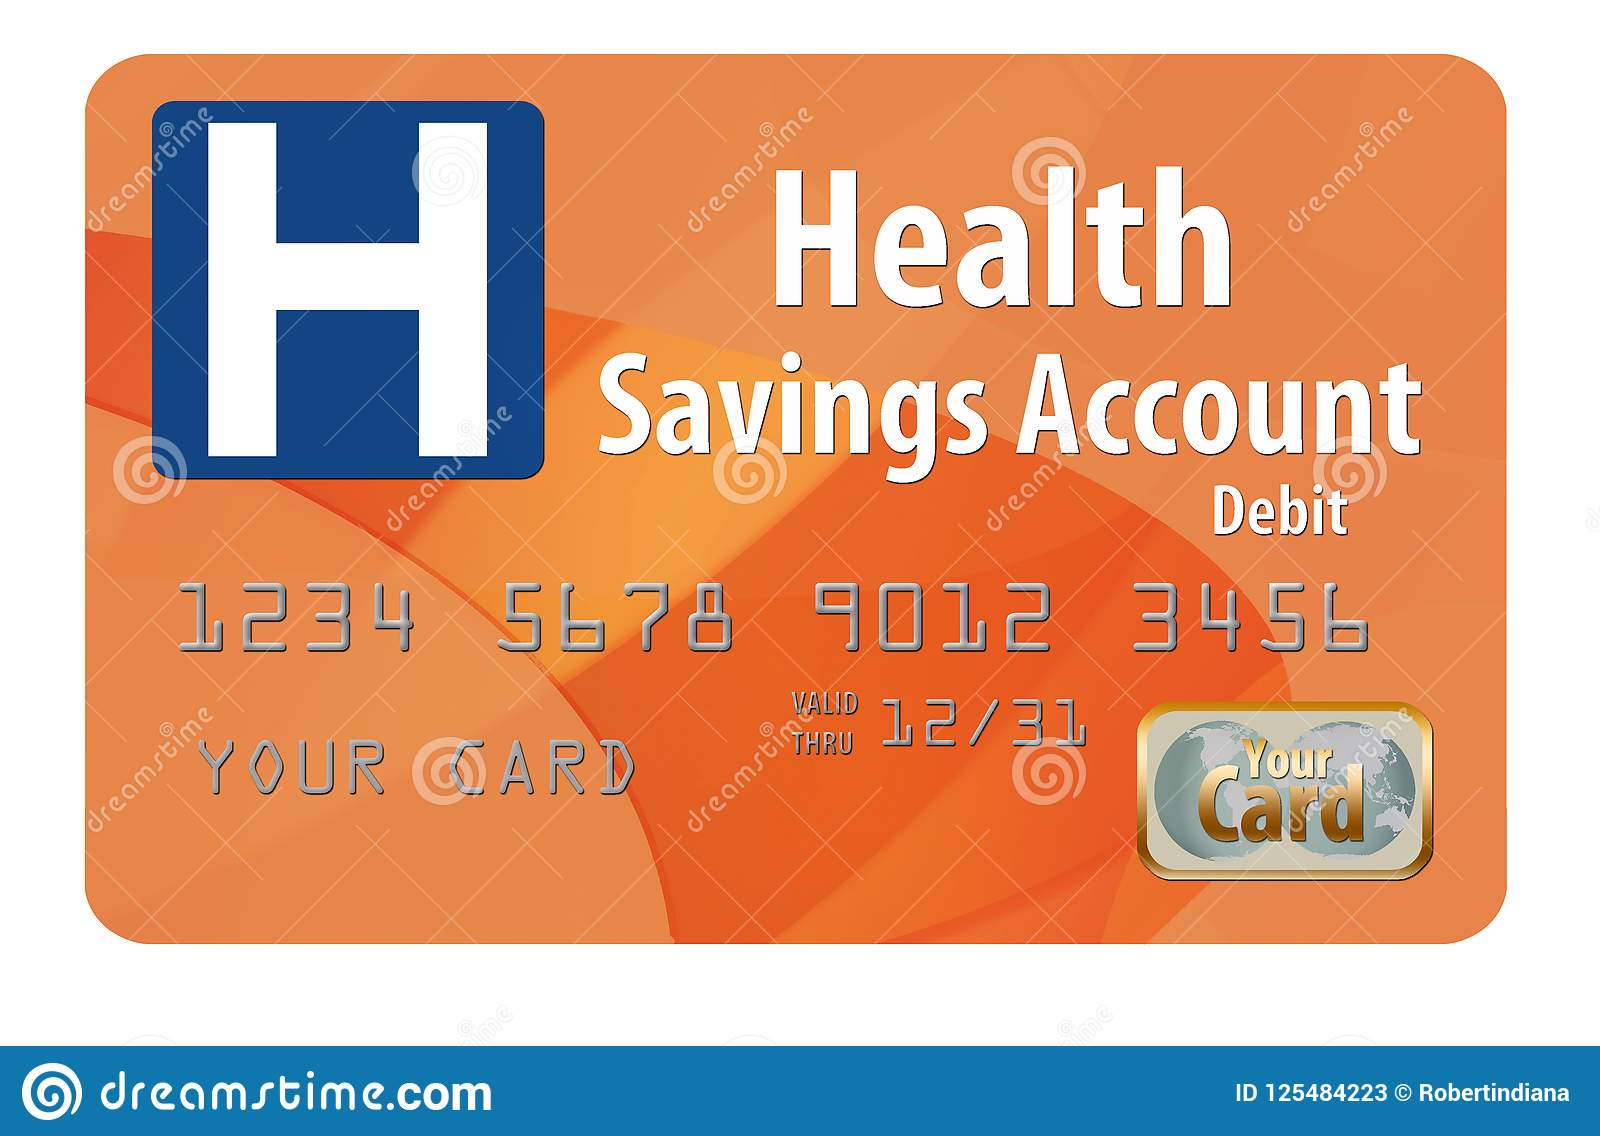 How to use the Savings Bank card